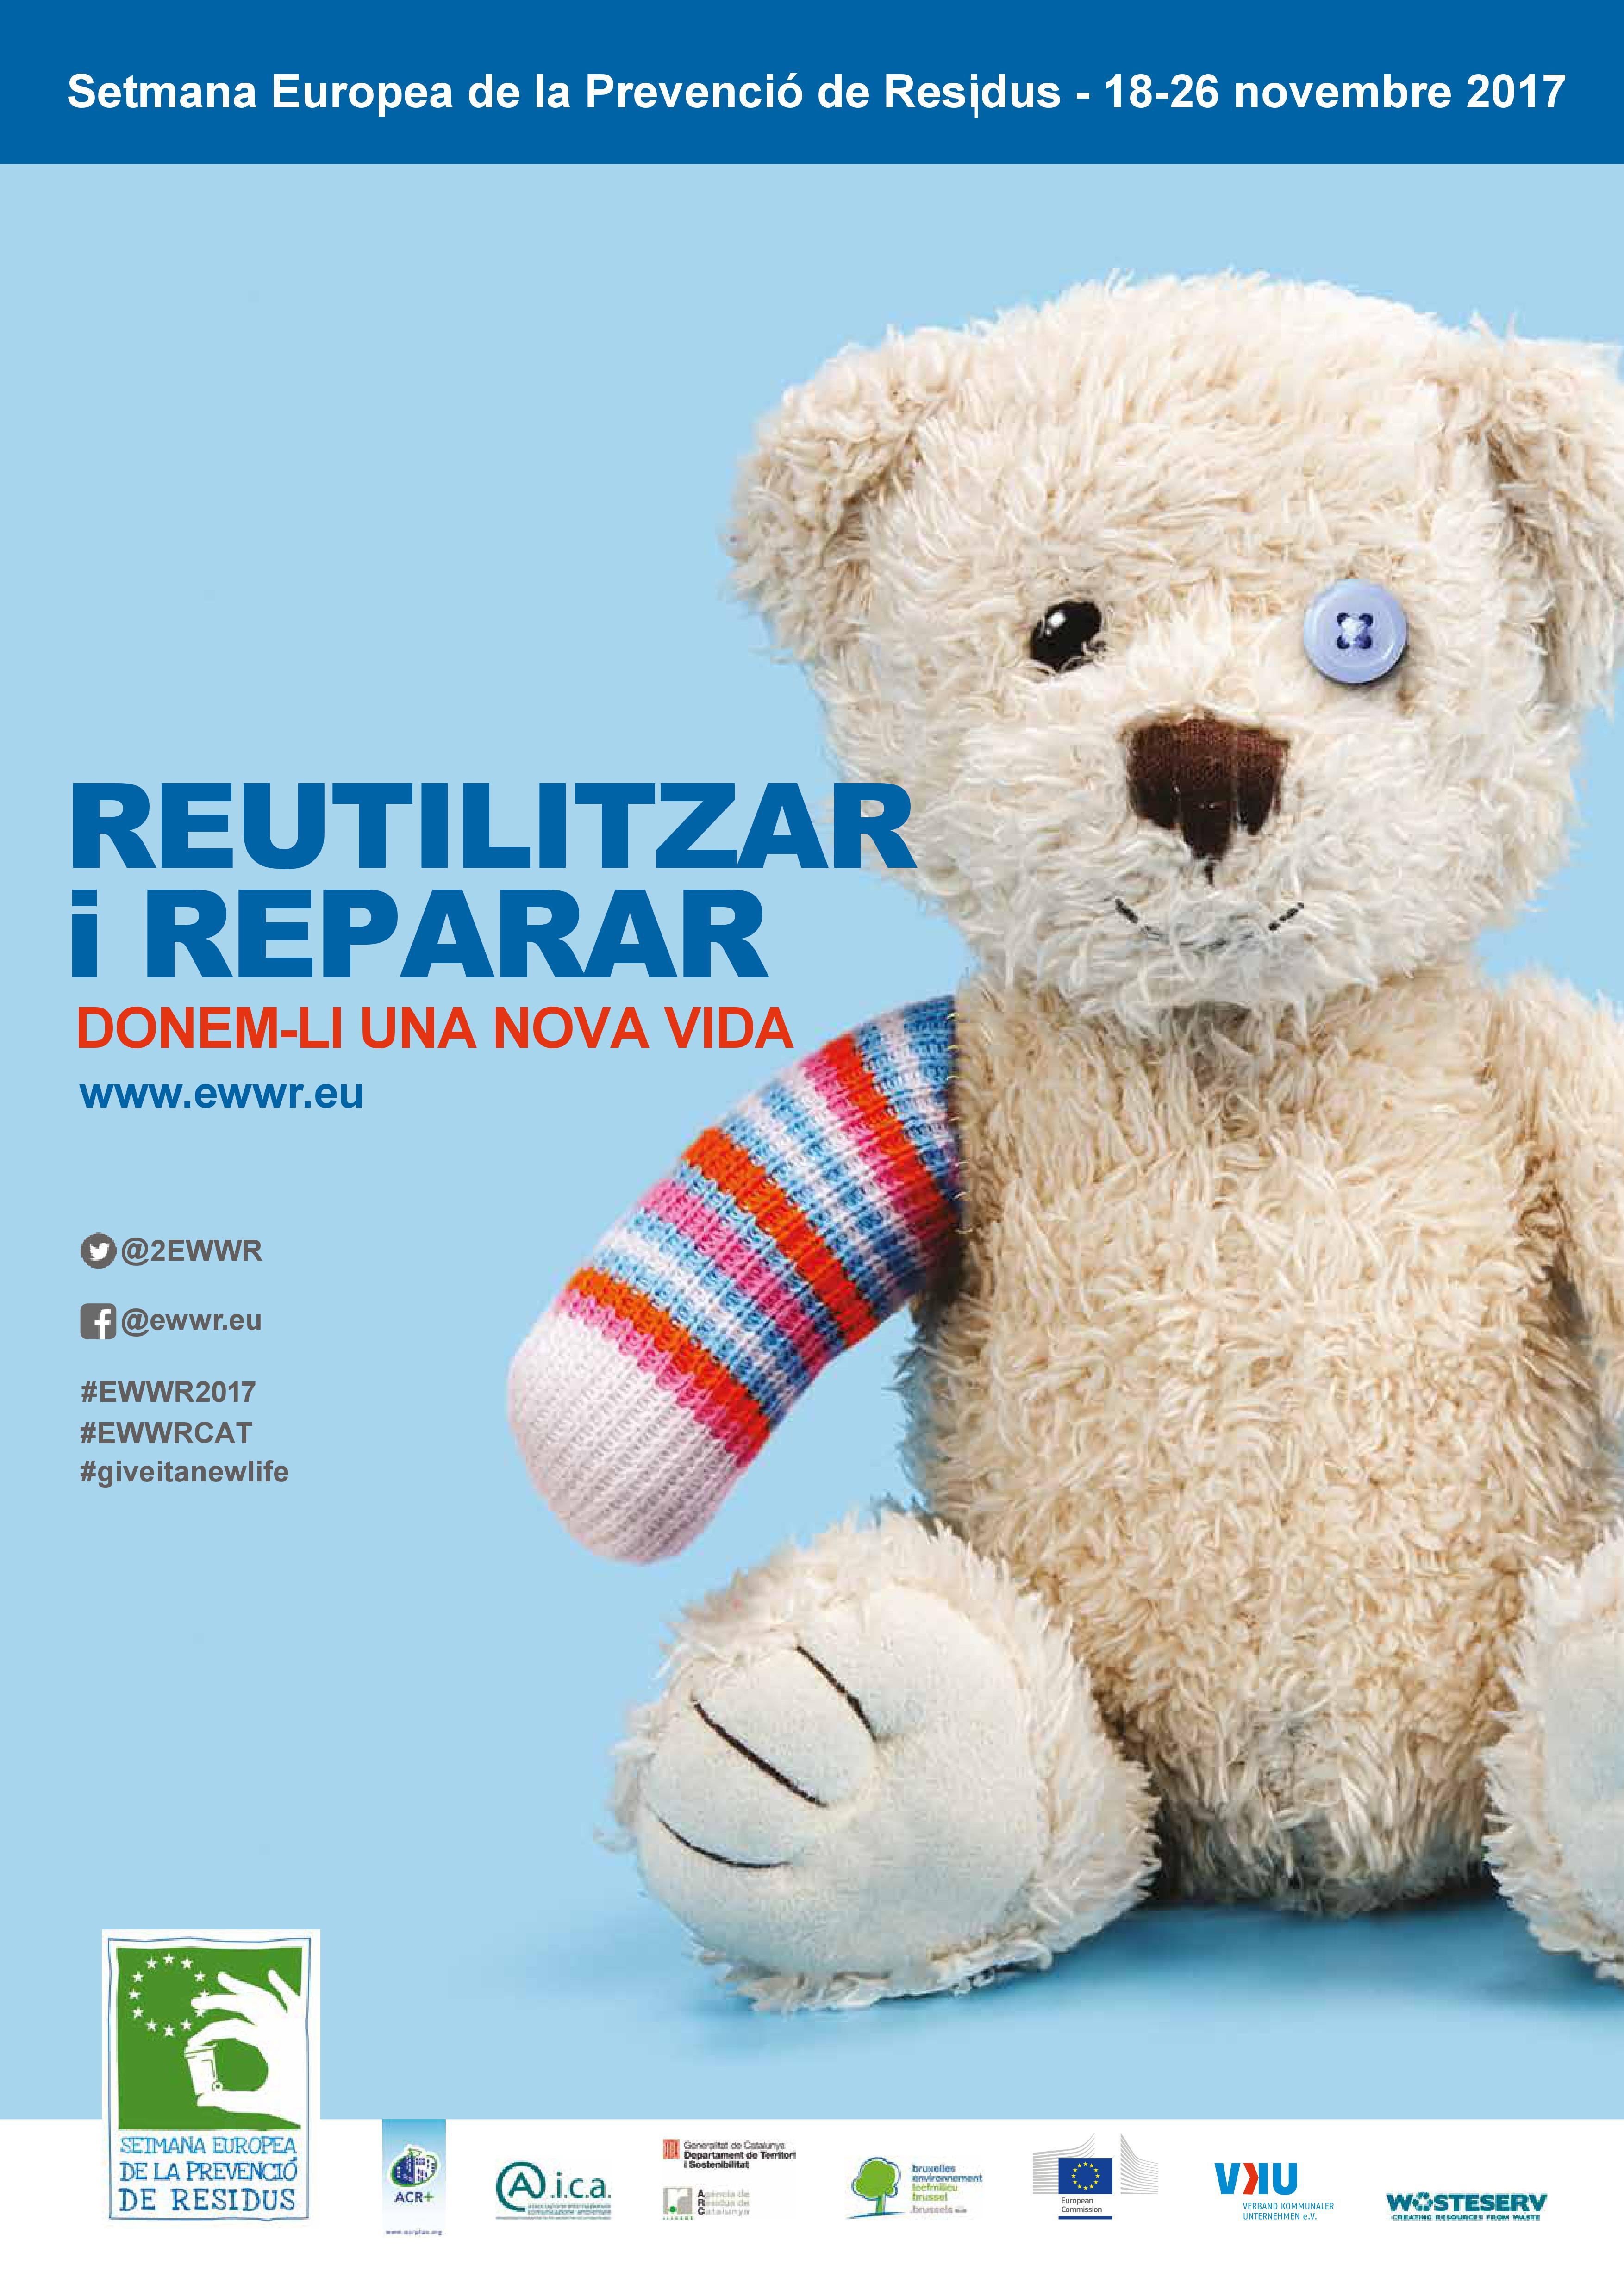 Setmana Europea de Prevenció de Residus 2017